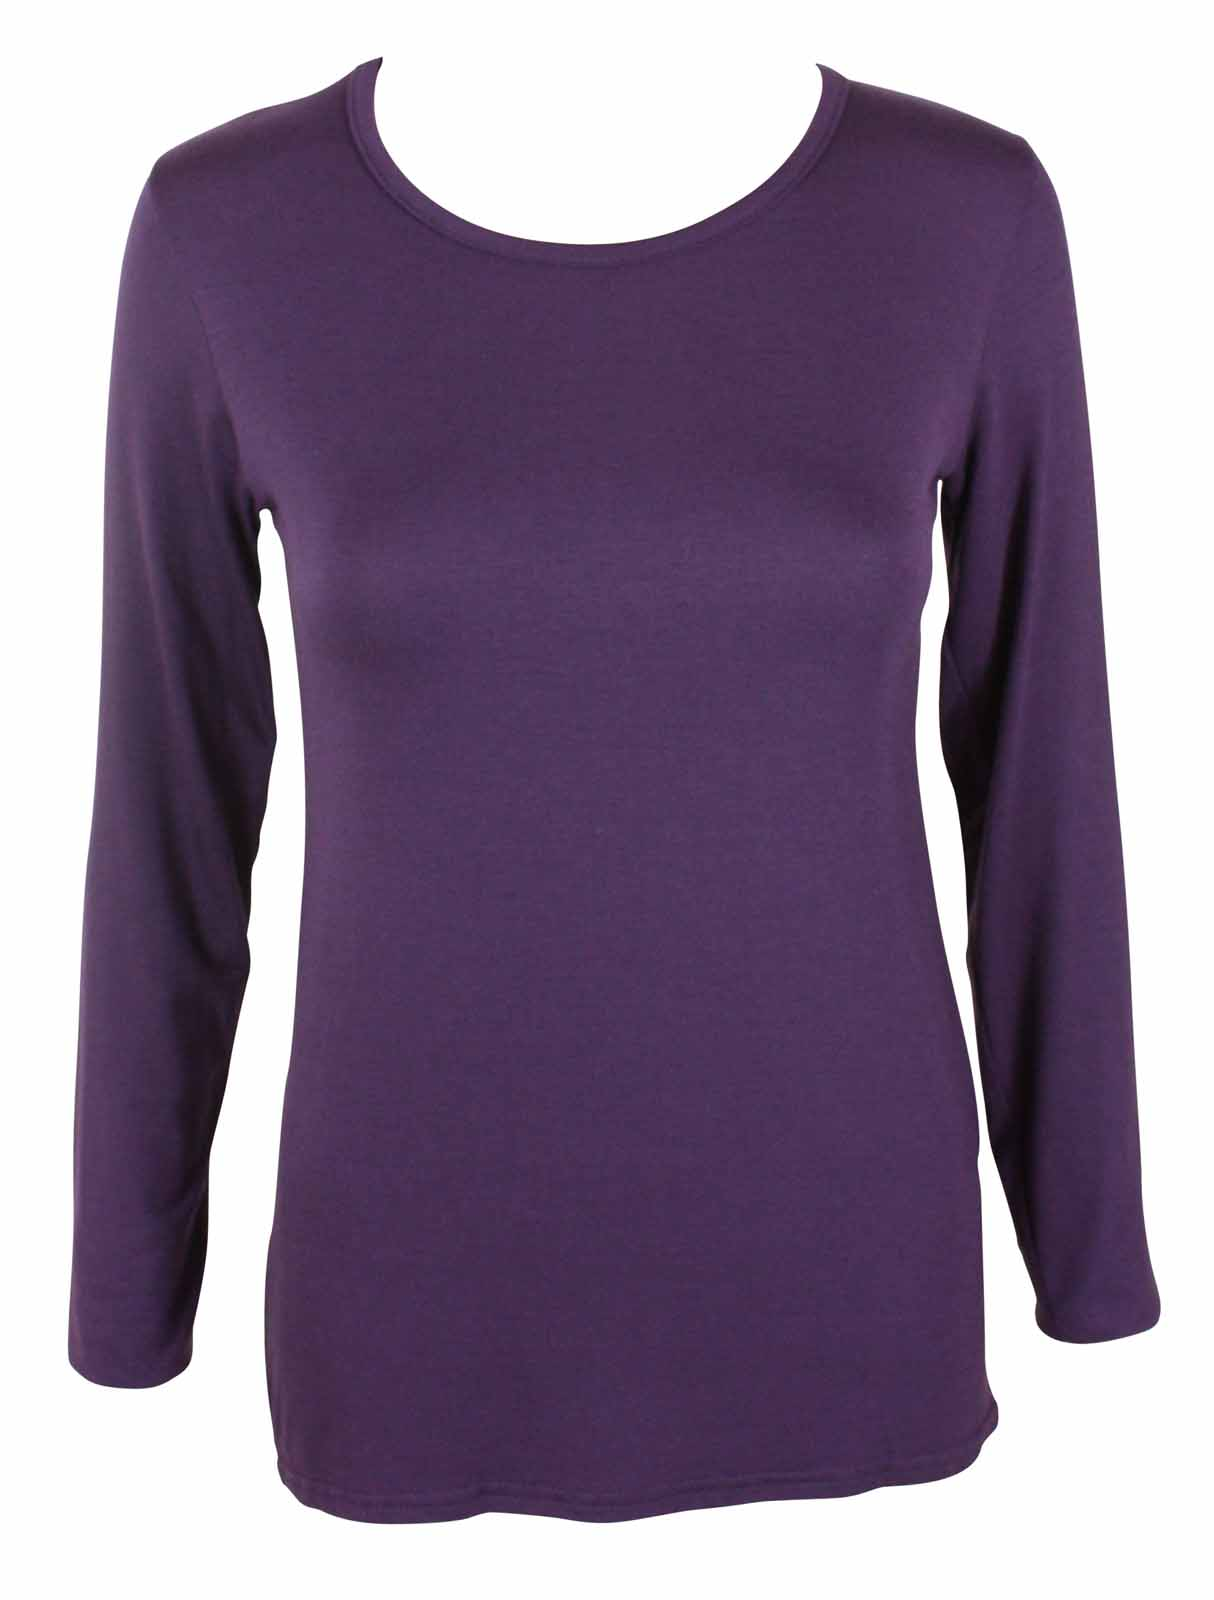 978ec035547f6d Ladies Plain Long Sleeved T Shirts - BCD Tofu House